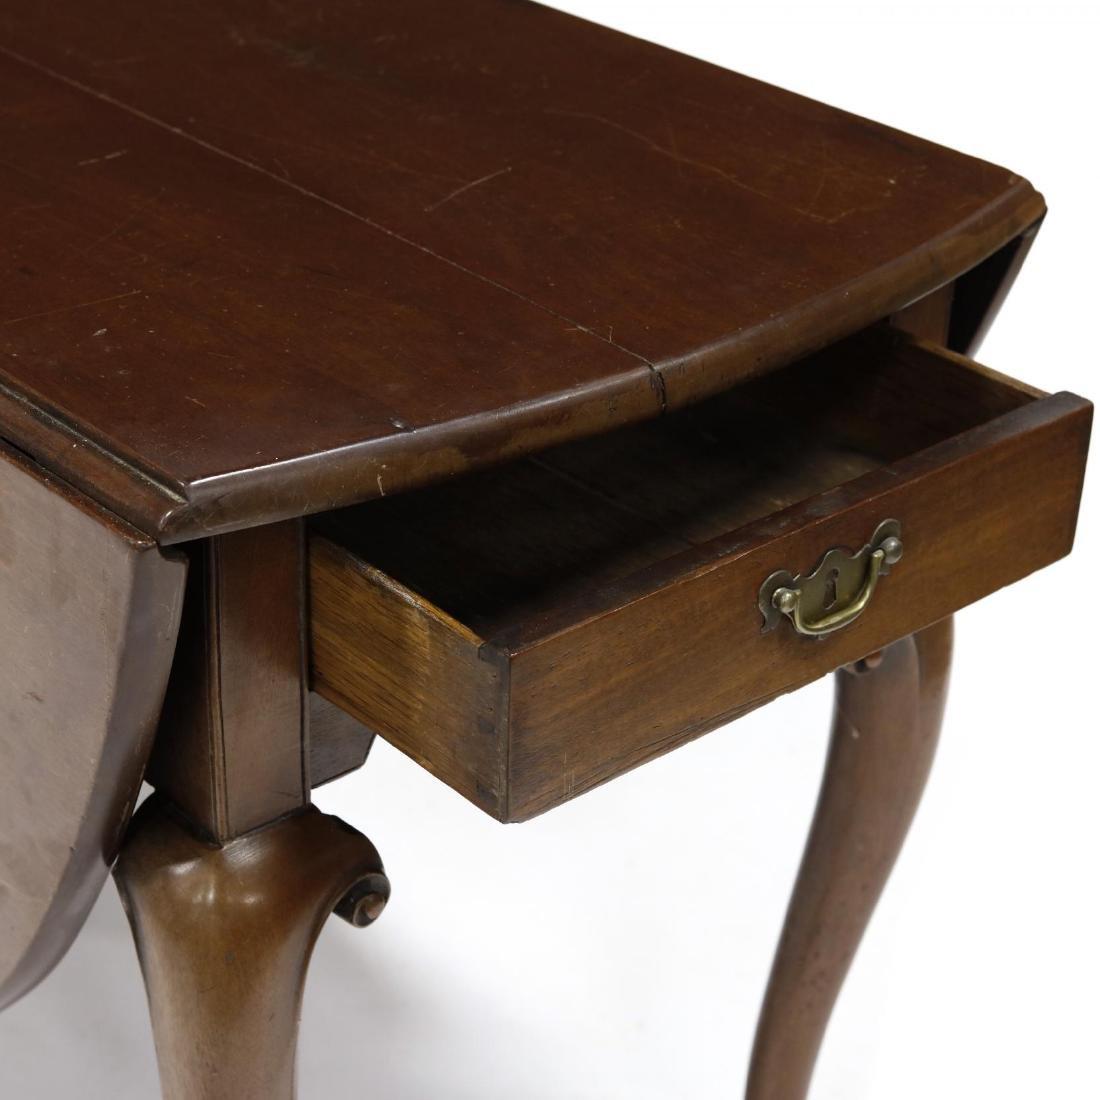 George II Drop Leaf Dining Table - 3